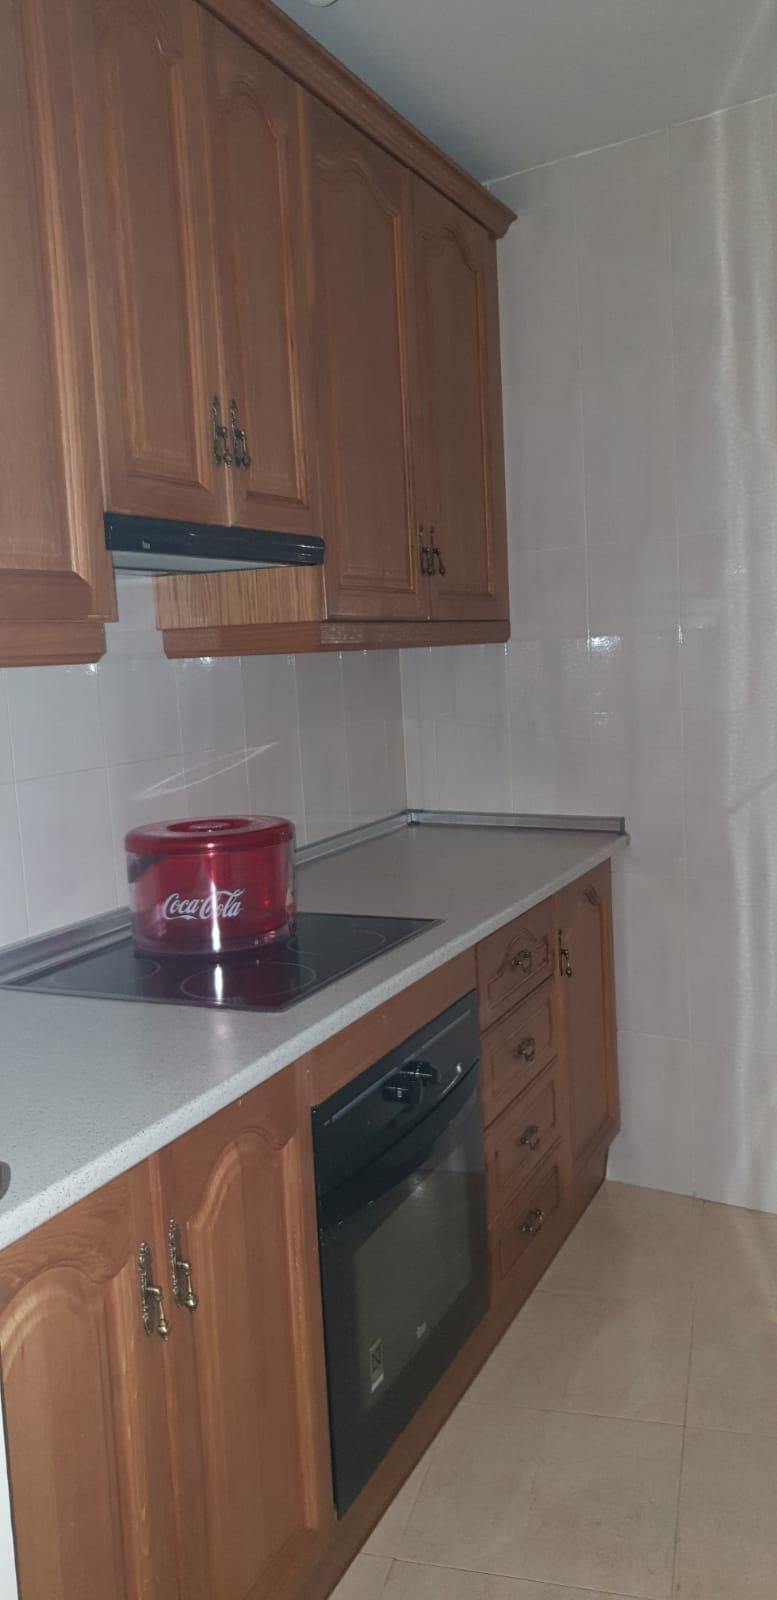 Apartamento en alquiler en Centro-Sagrario (Granada), 500 €/mes (Temporada)